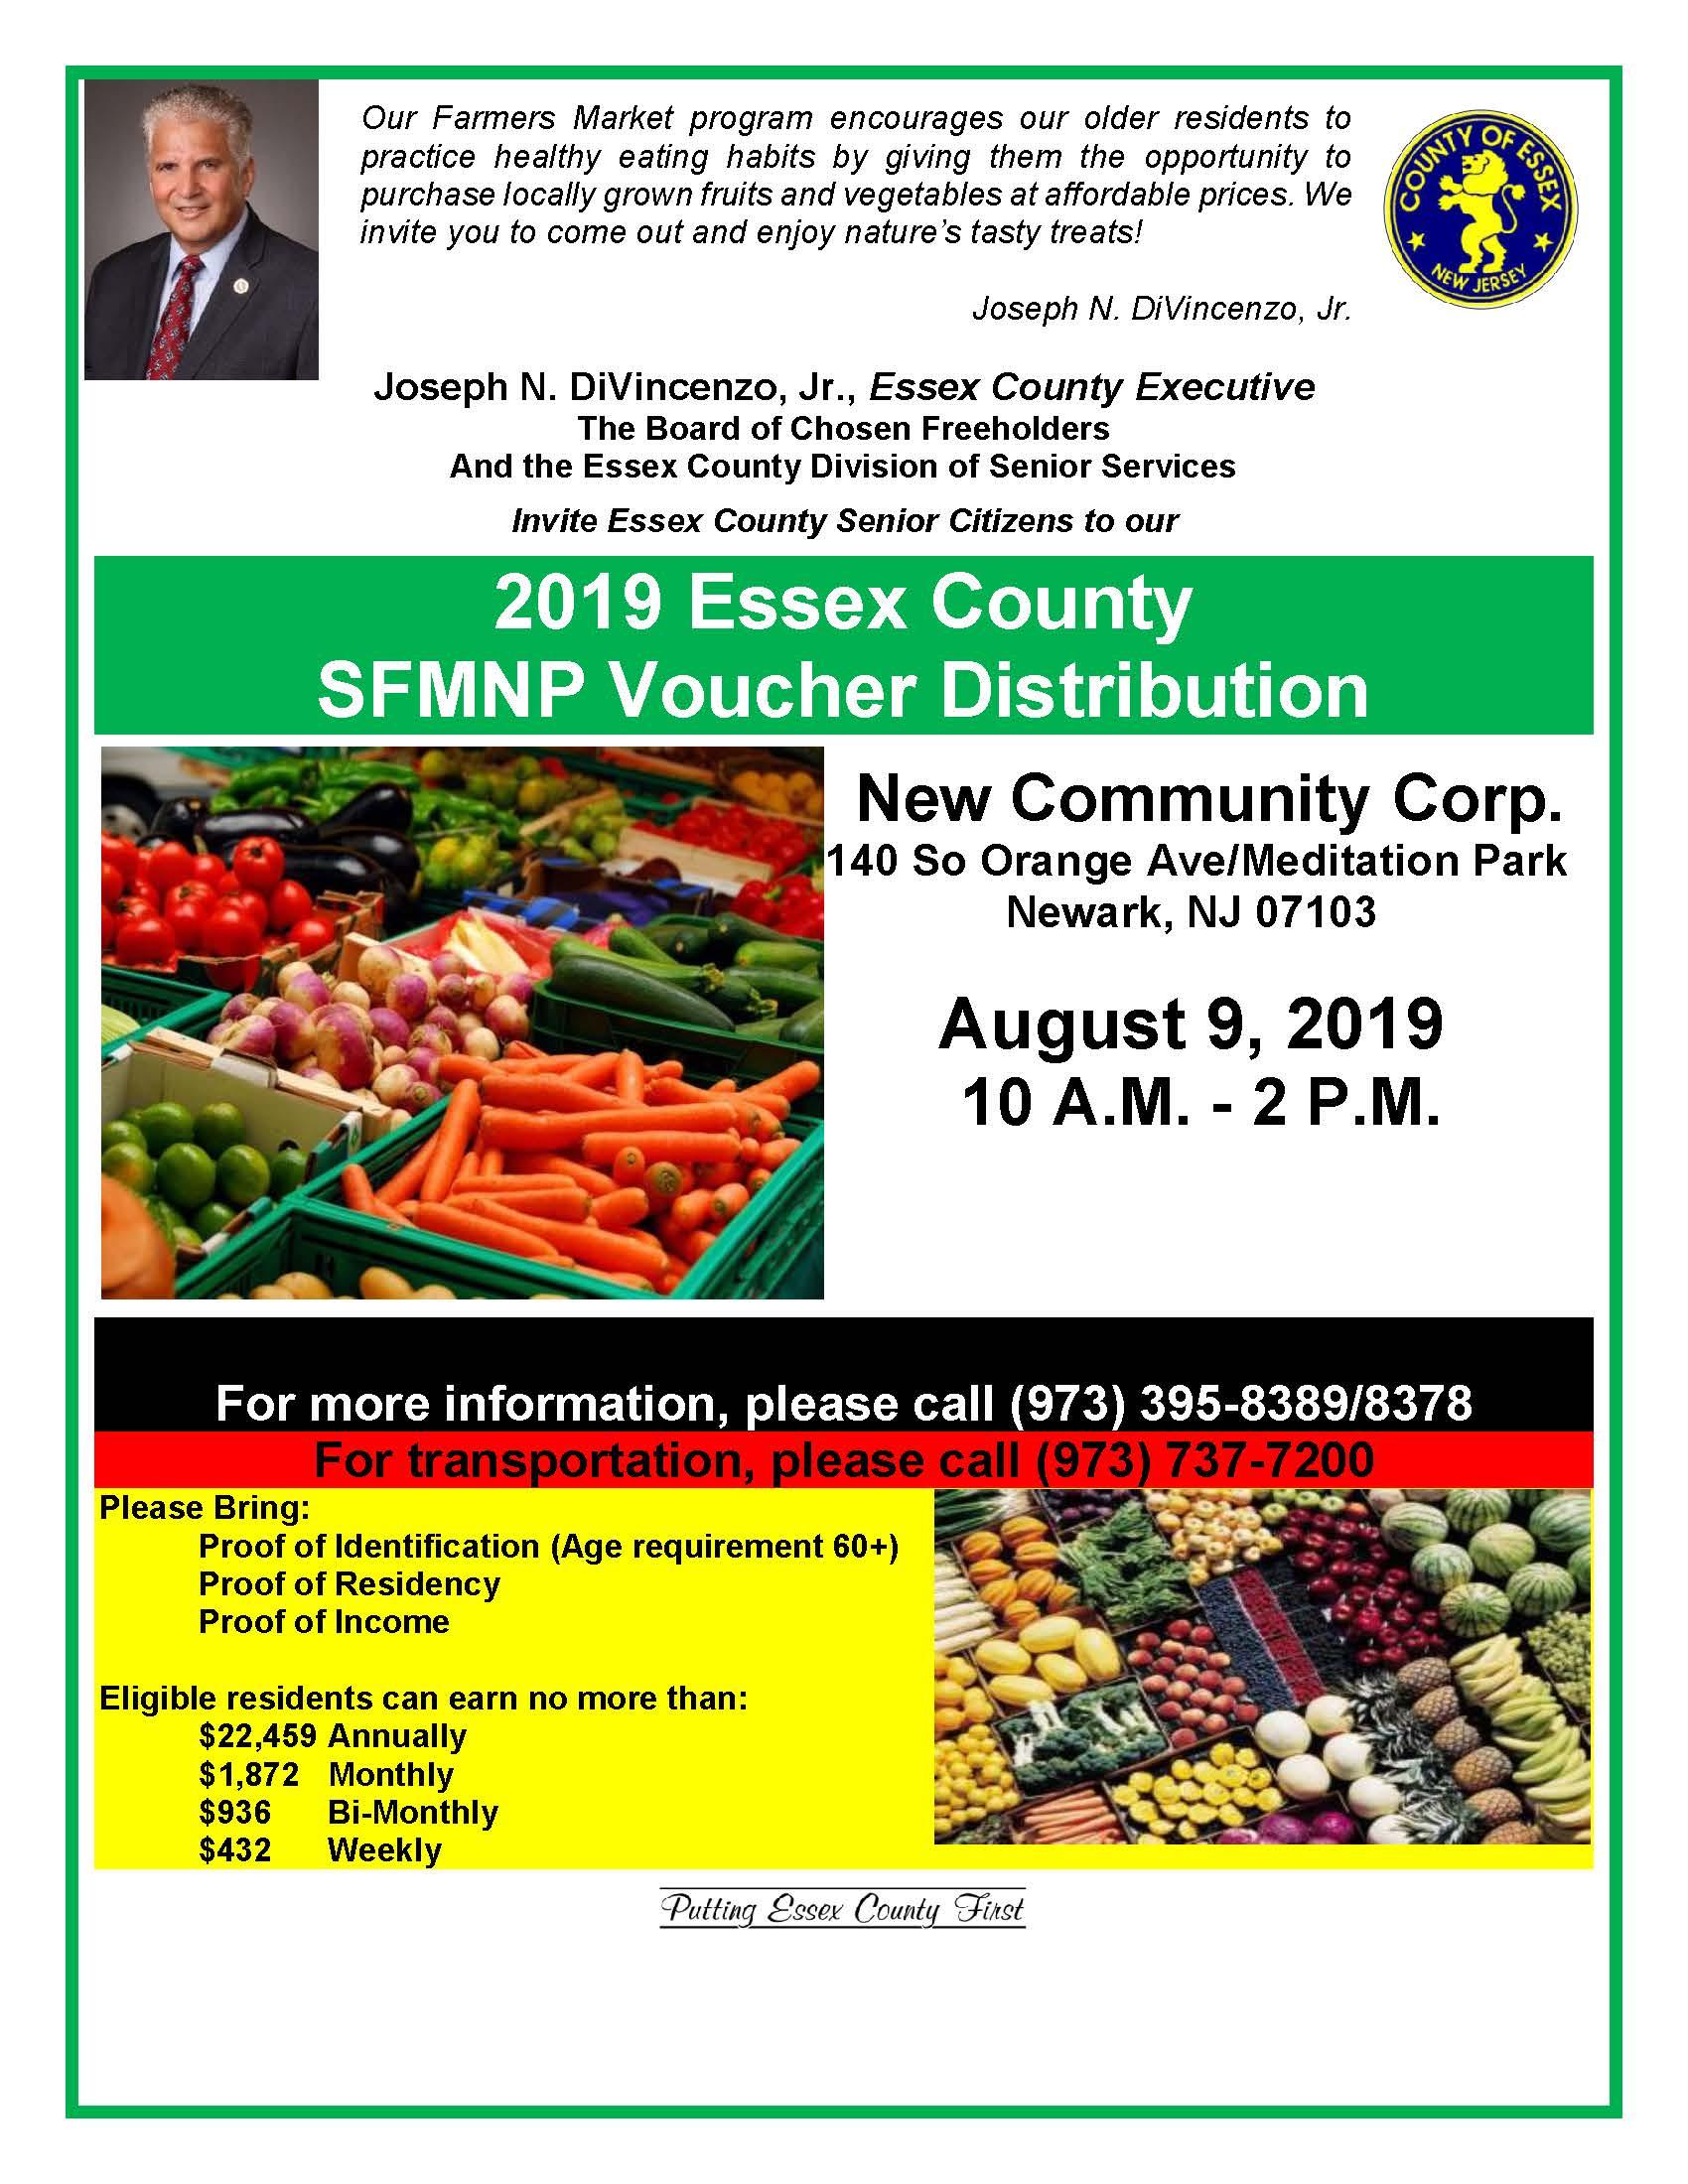 New Community to Host Farmers Market for Seniors Aug. 9